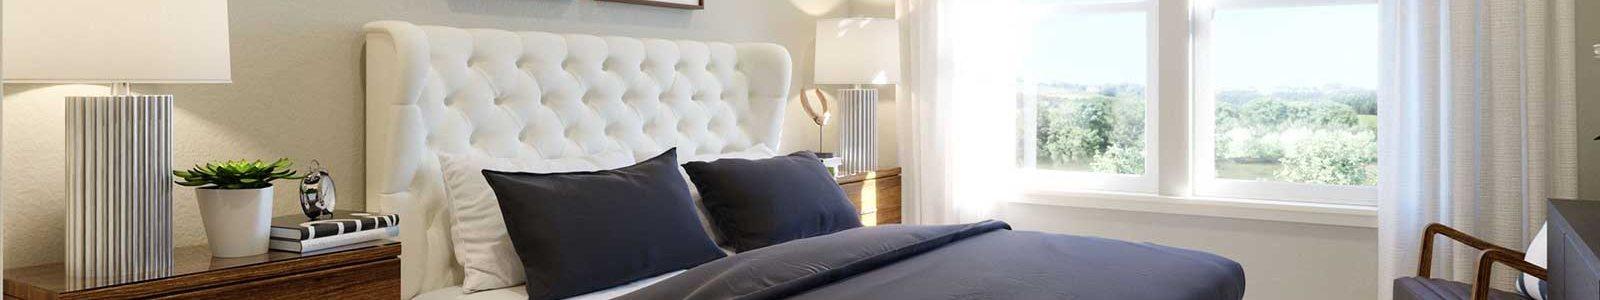 Beautiful Bright Bedroom With Wide Windows at Alira, Sacramento, California